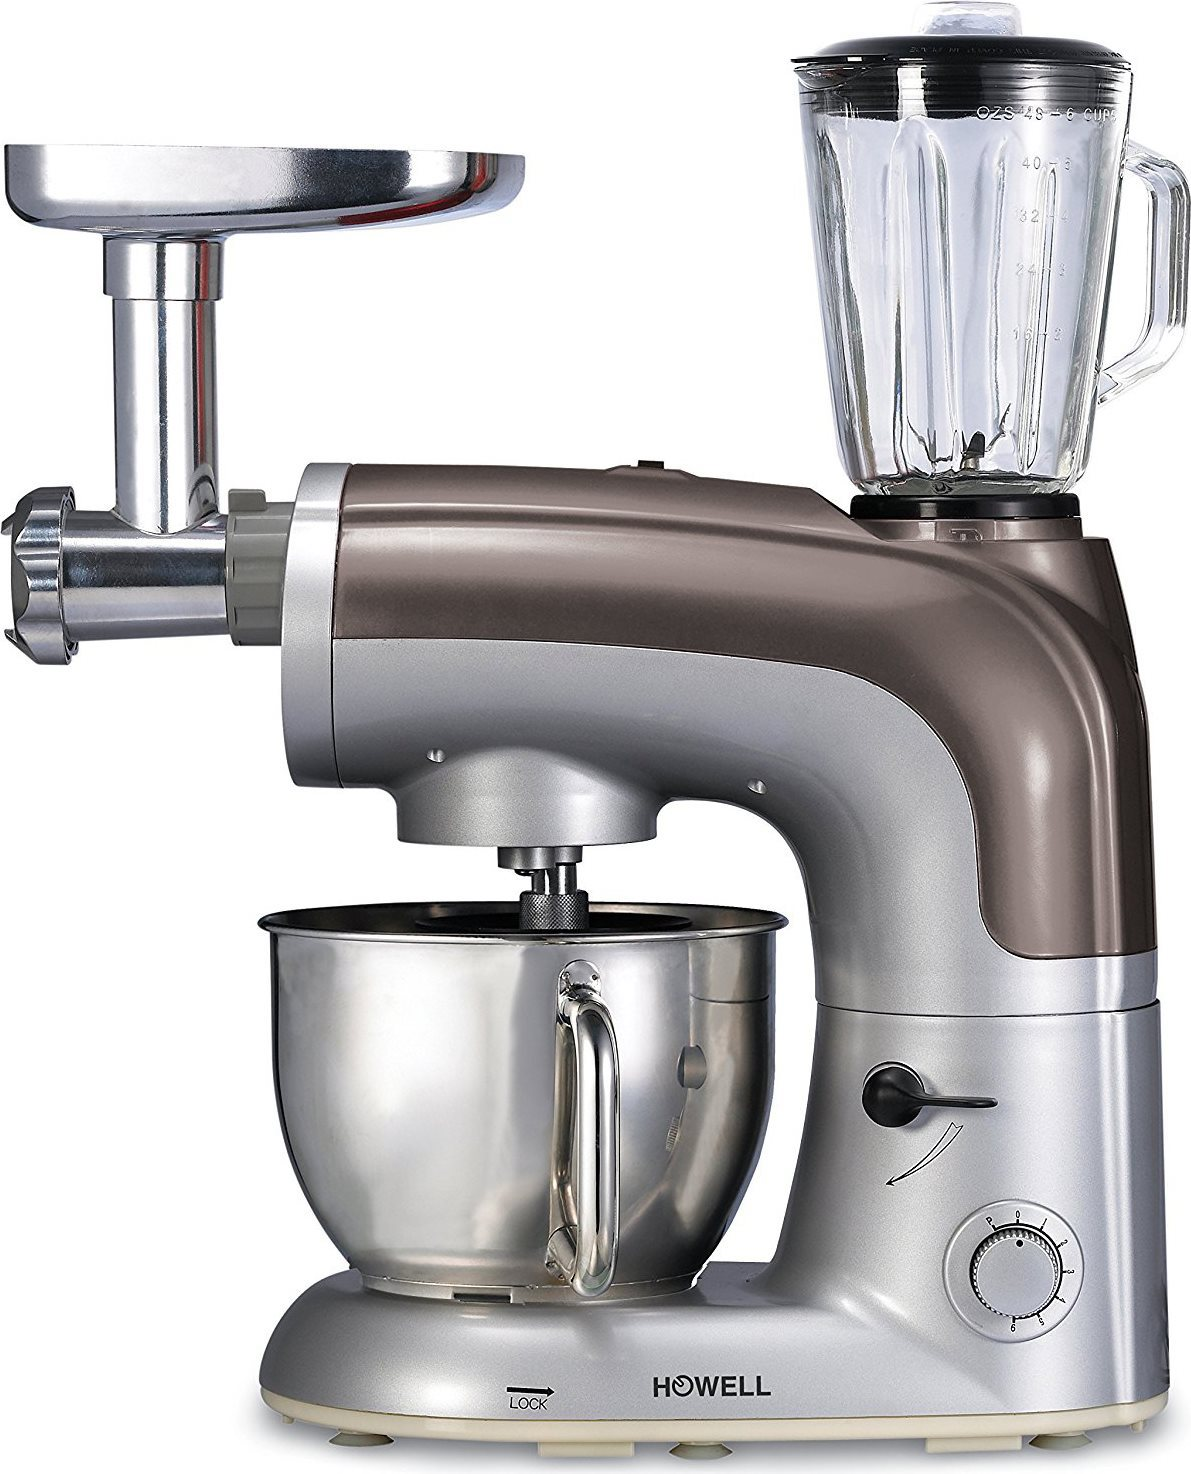 HOWELL Robot da Cucina Impastatrice Professionale multifunzione ...